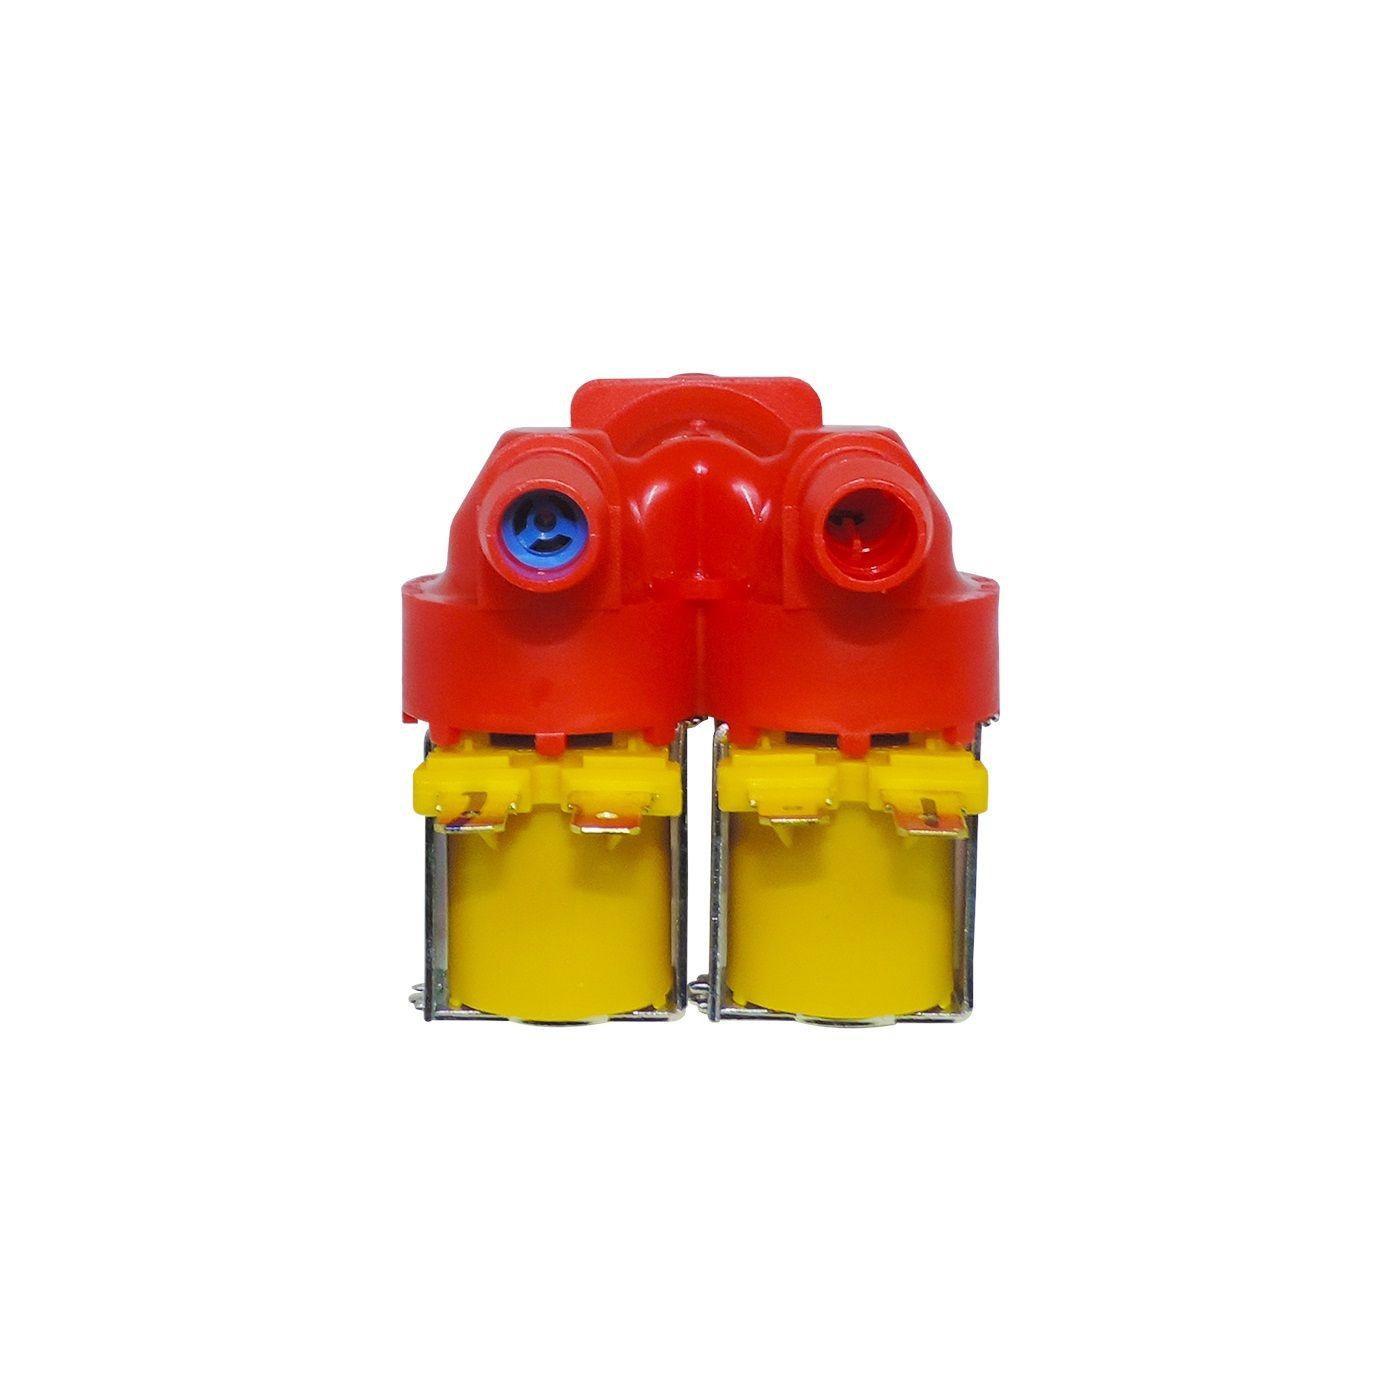 Válvula Lavadora Electrolux Lf10 Lf75 Lt12 Lte12 64287476